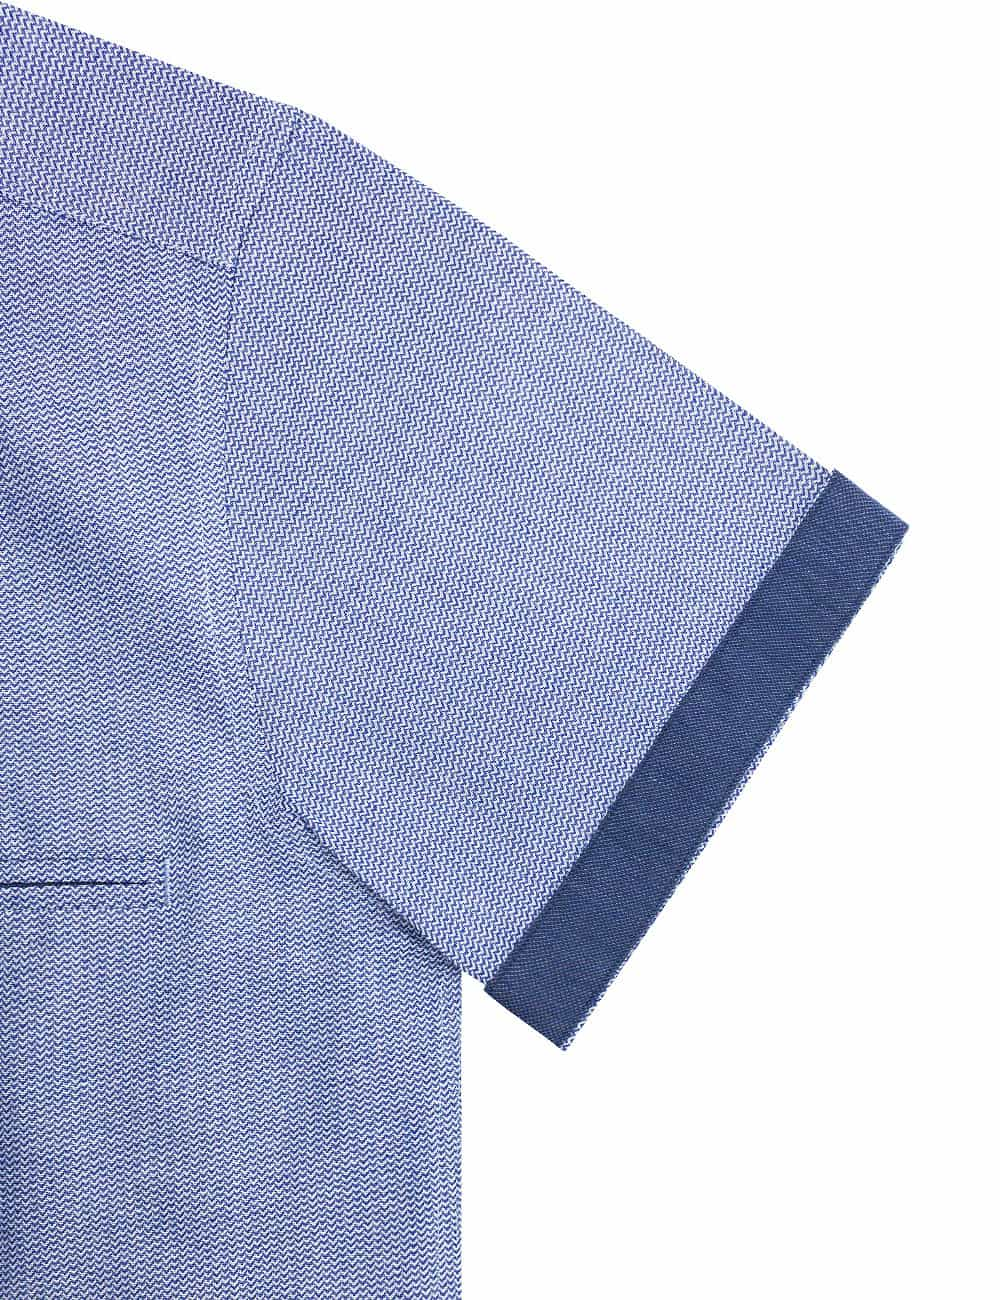 RF Blue Waves Cotton Blend Easy Iron Short Sleeve Shirt RF9SNB3.15